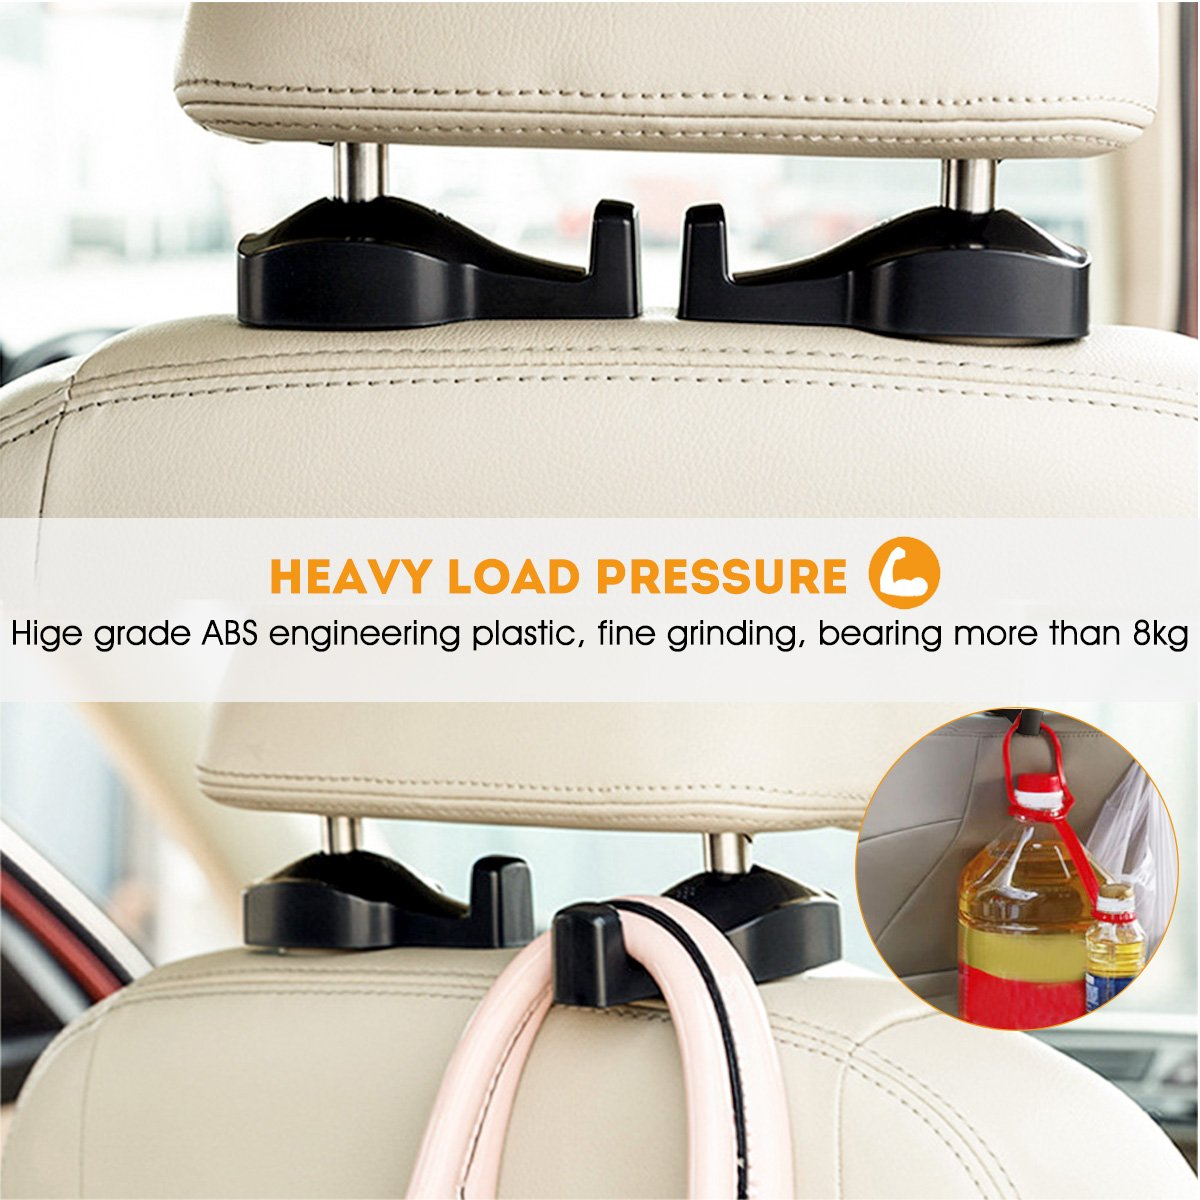 Purses Car Seat Hanger 6 Pack Space Saving Auto Back Seat Hidden Hooks Seat Headrest Hanger For Handbags and Grocery Bags Coats Universal Vehicle Car Seat Back Headrest Holder D-FLIFE INC 5559021200